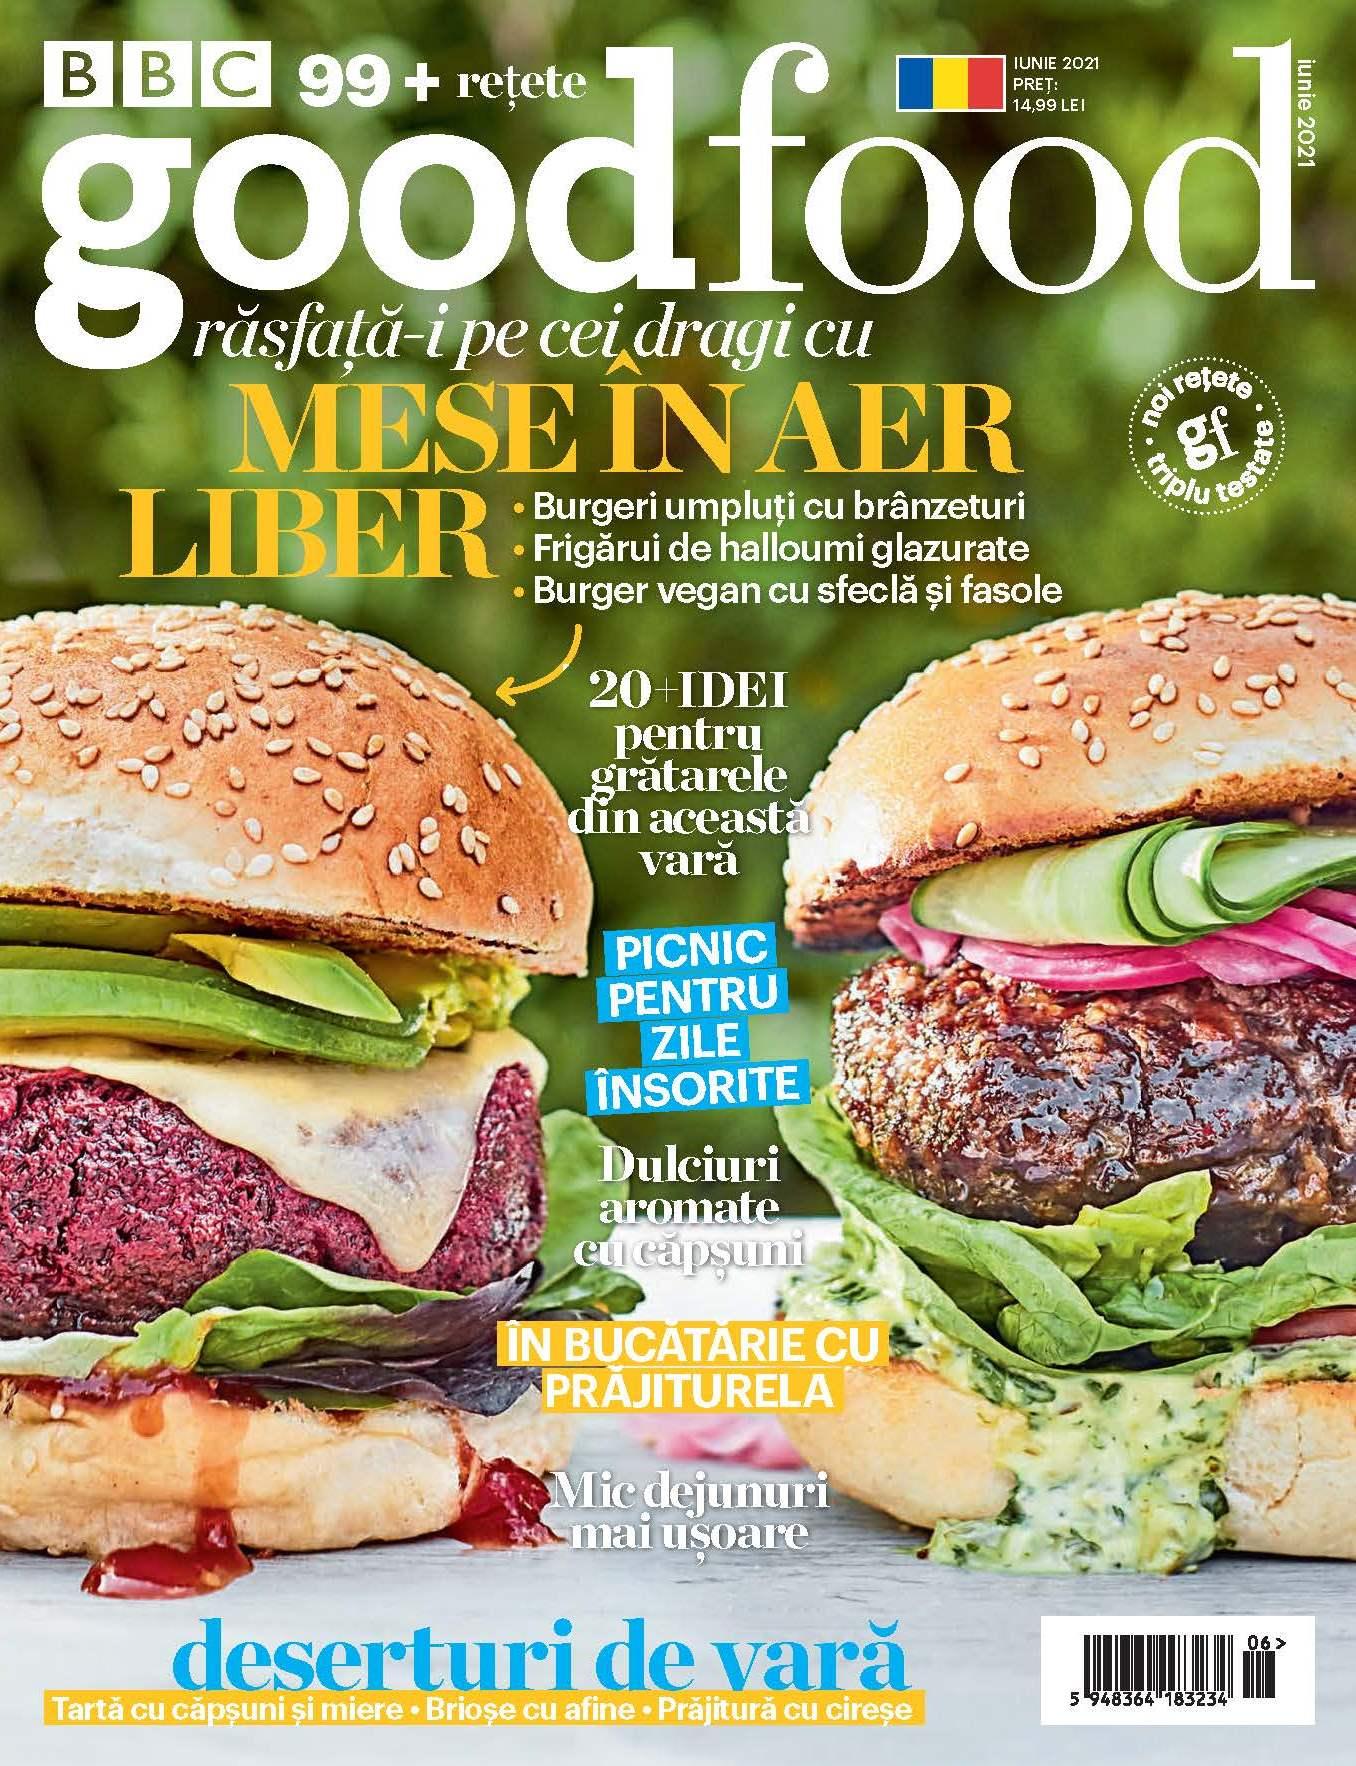 BBC Good Food Ro 06 2021_Page_001